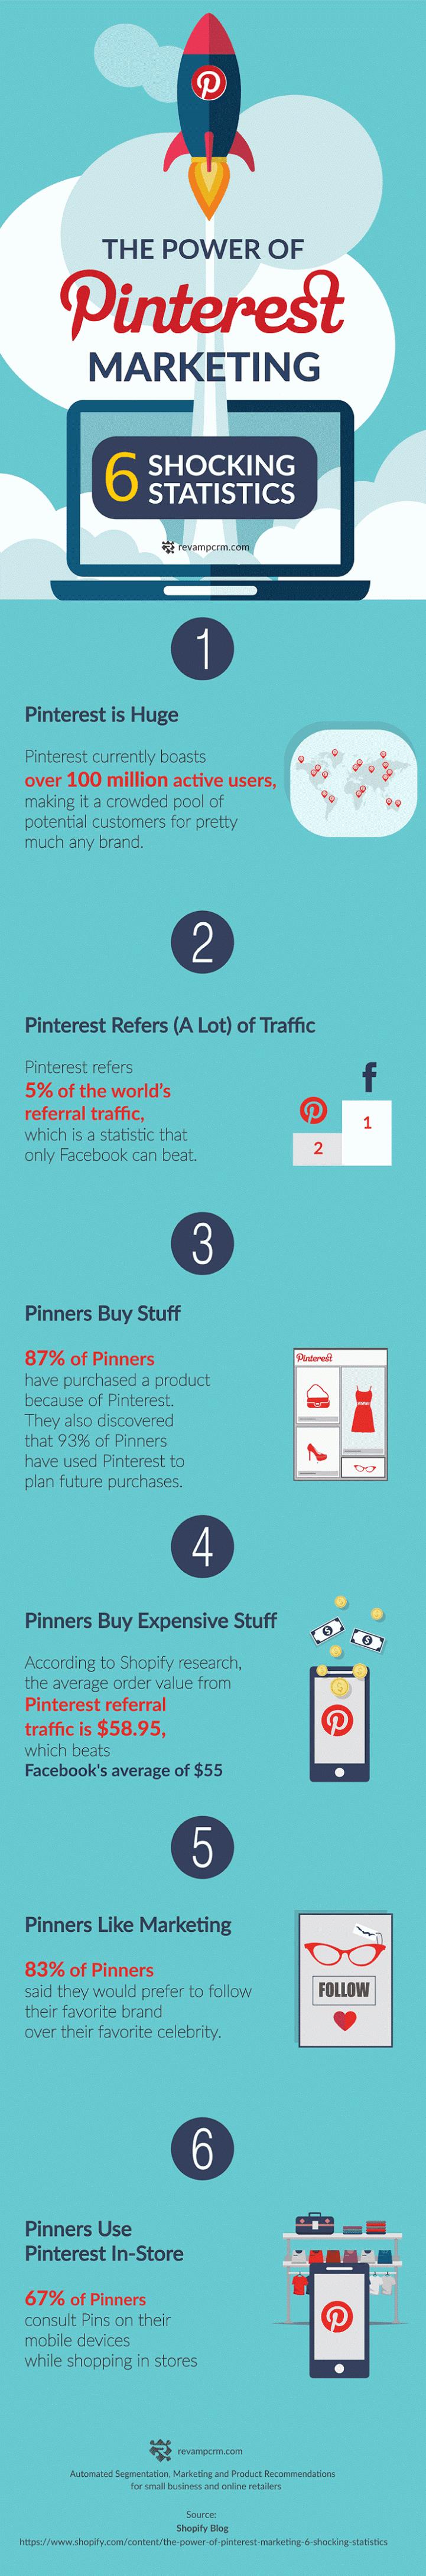 6-shocking-pinterest-statistics-infographic-DIW.png